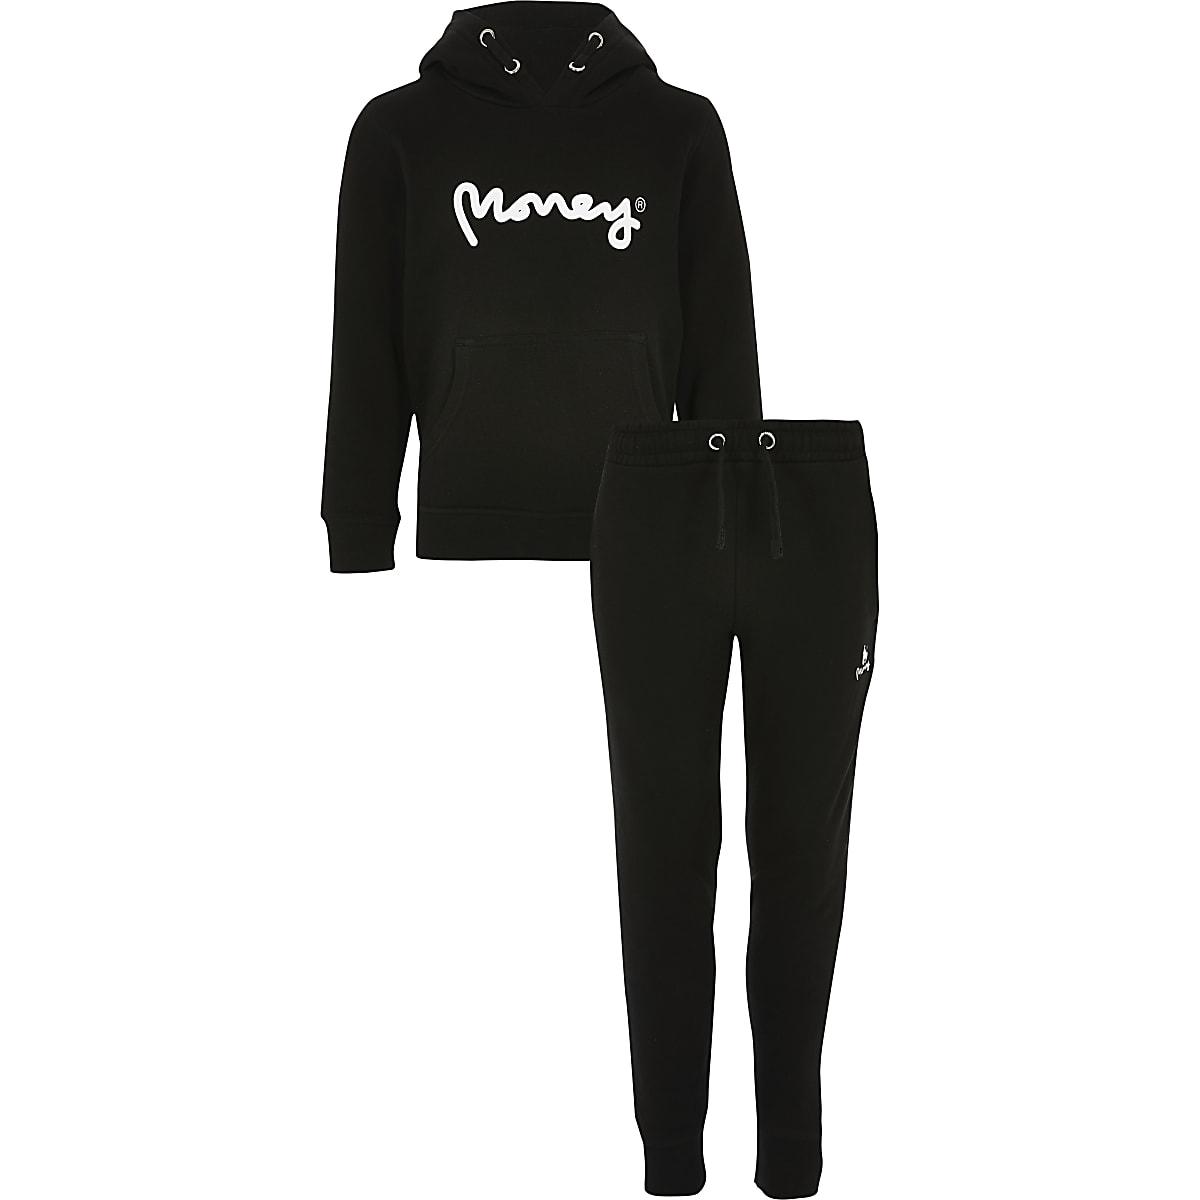 Boys black Money hoodie outfit